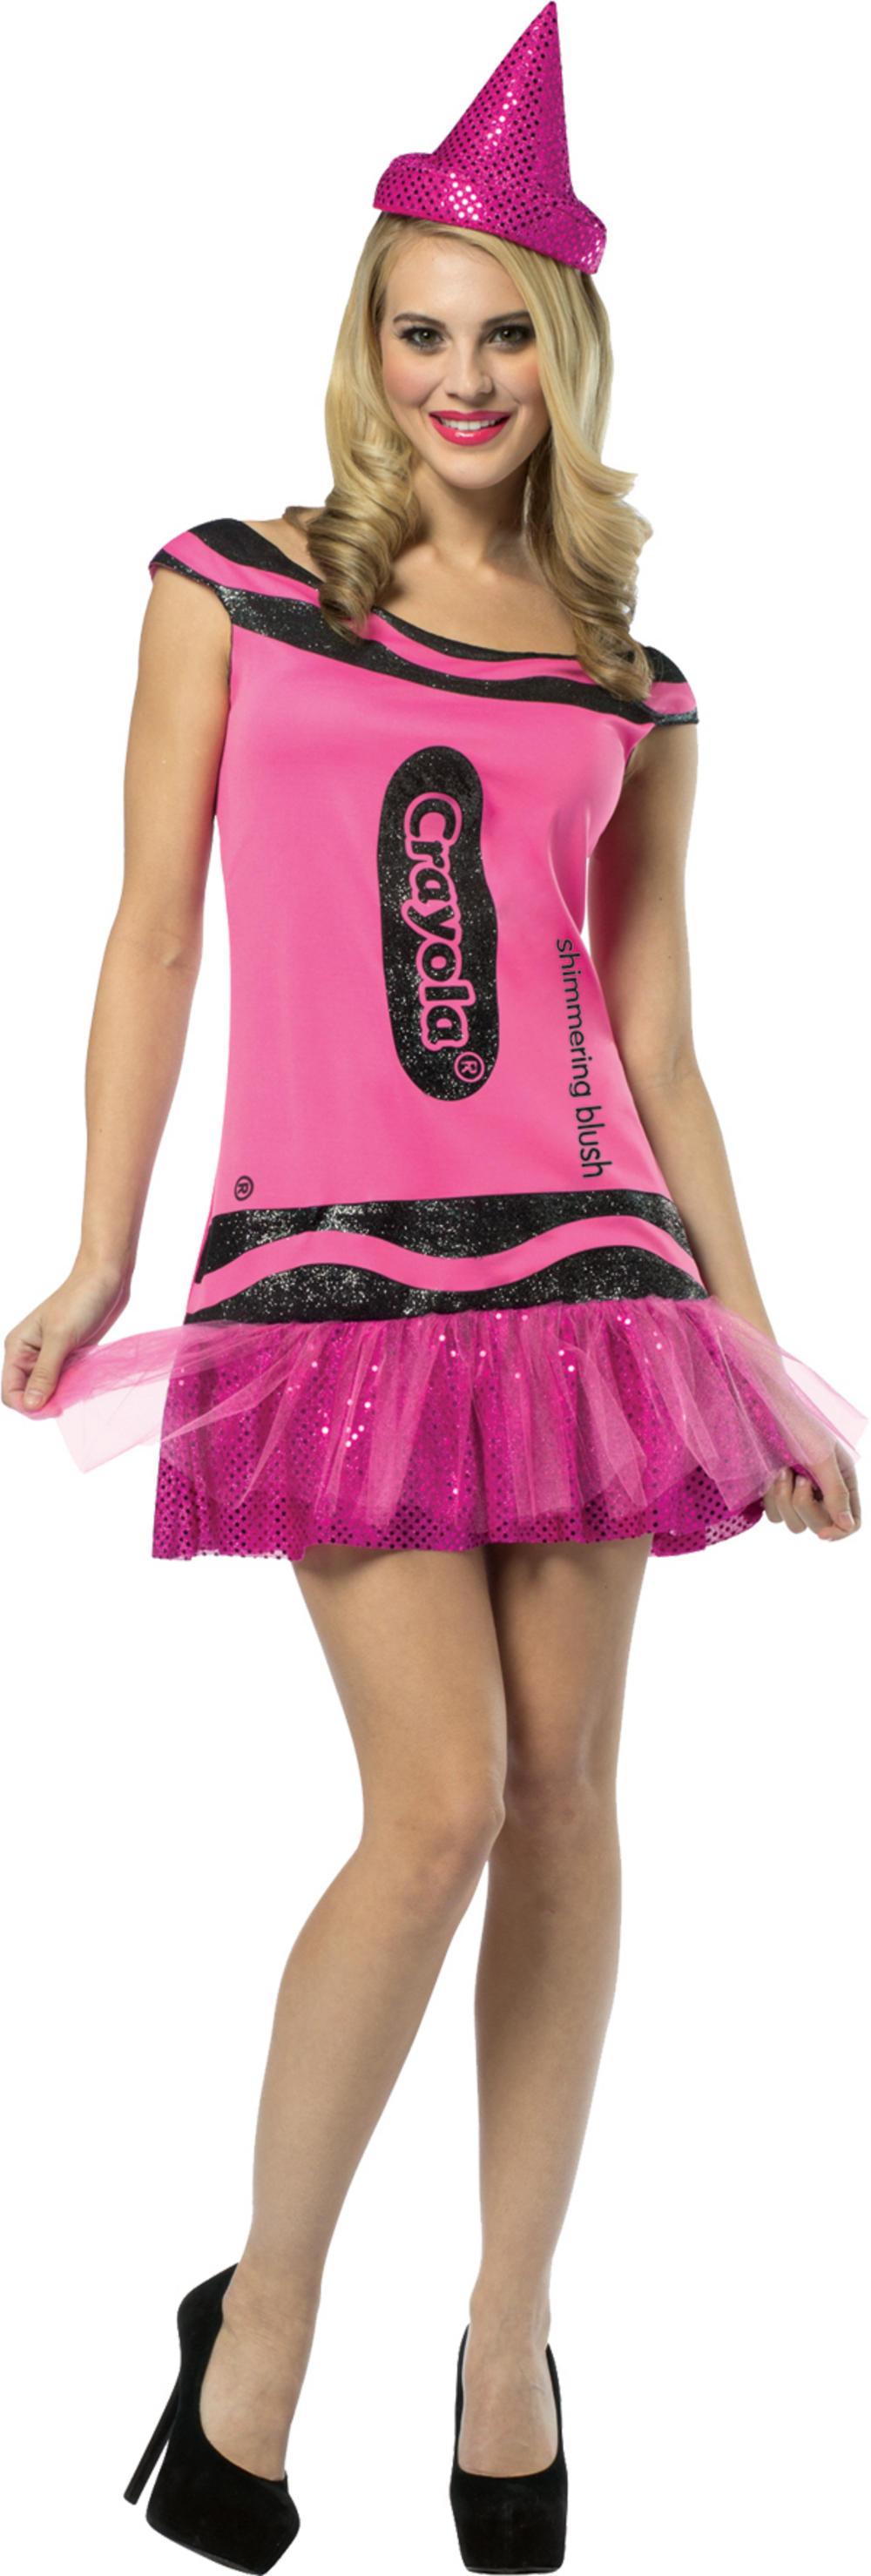 Blush Pink Crayola Glitter Dress Ladies Costume